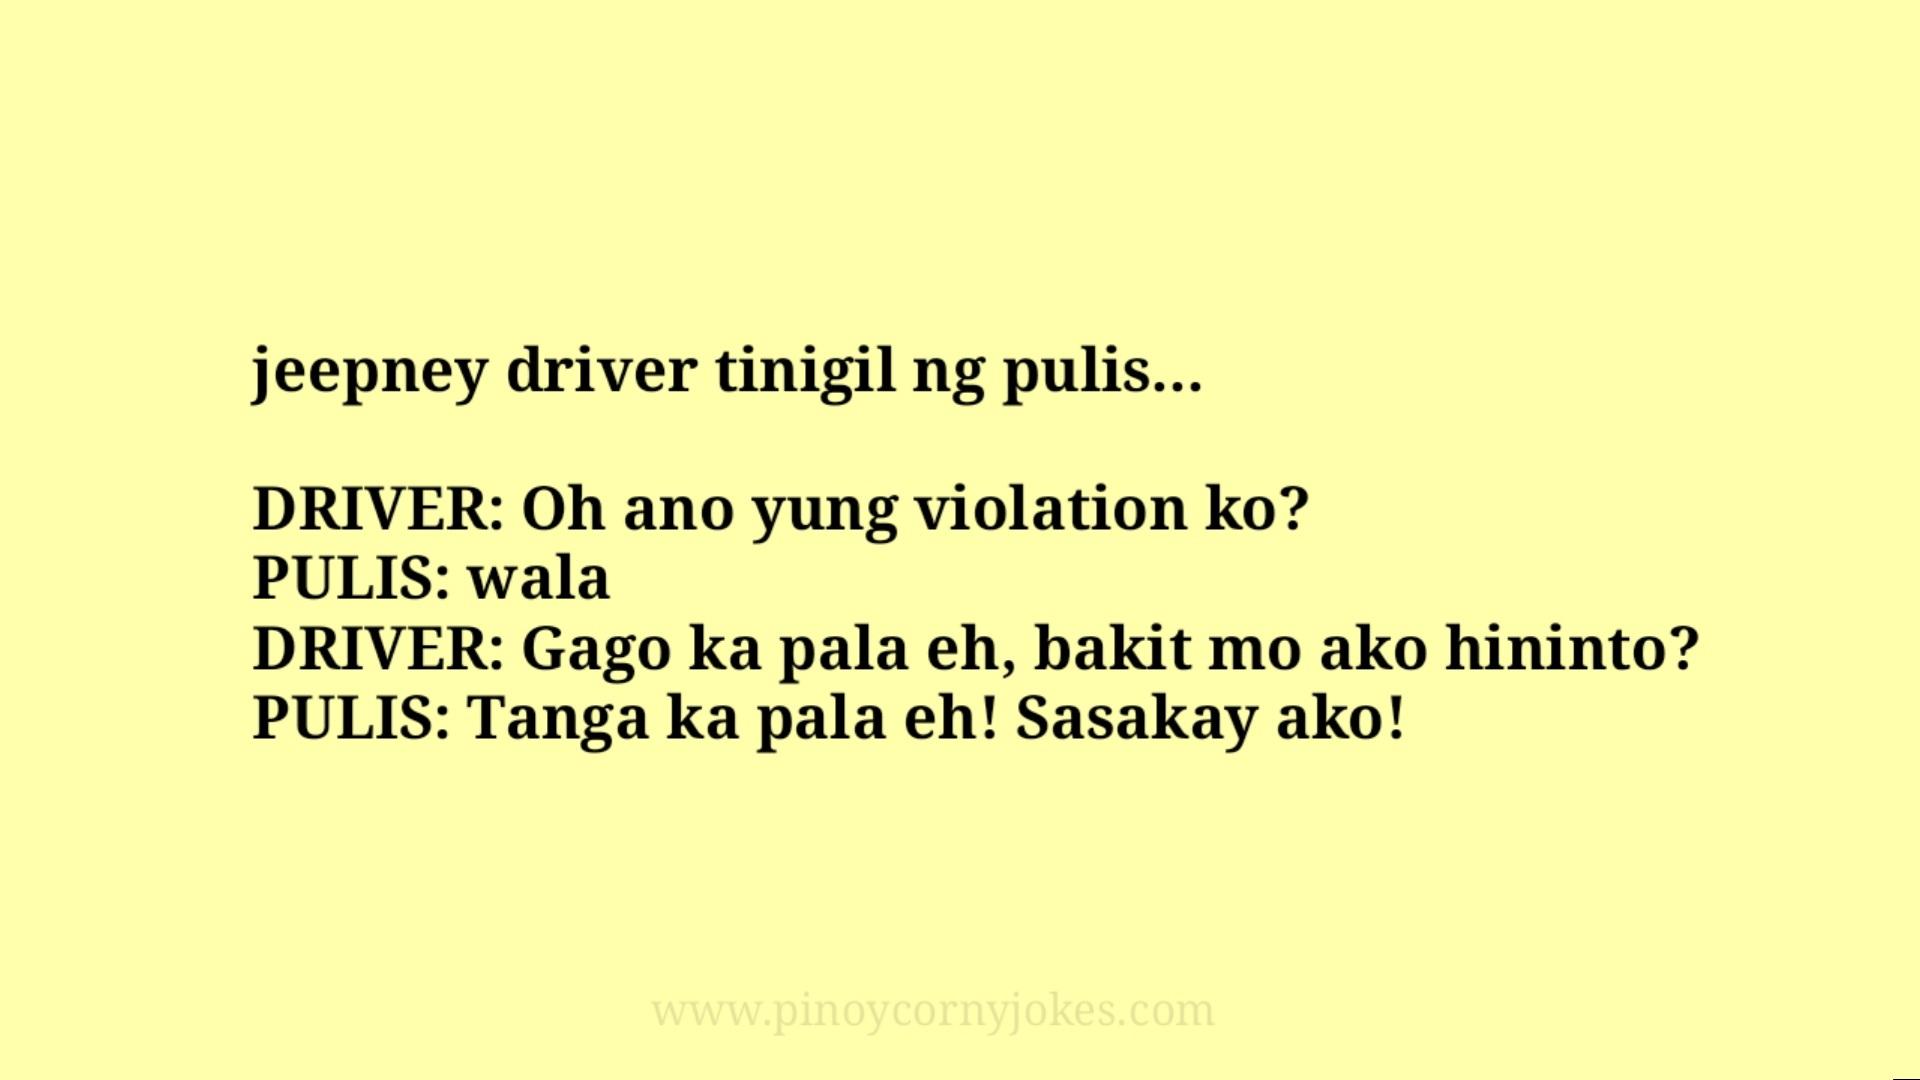 jeepney tagalog jokes police